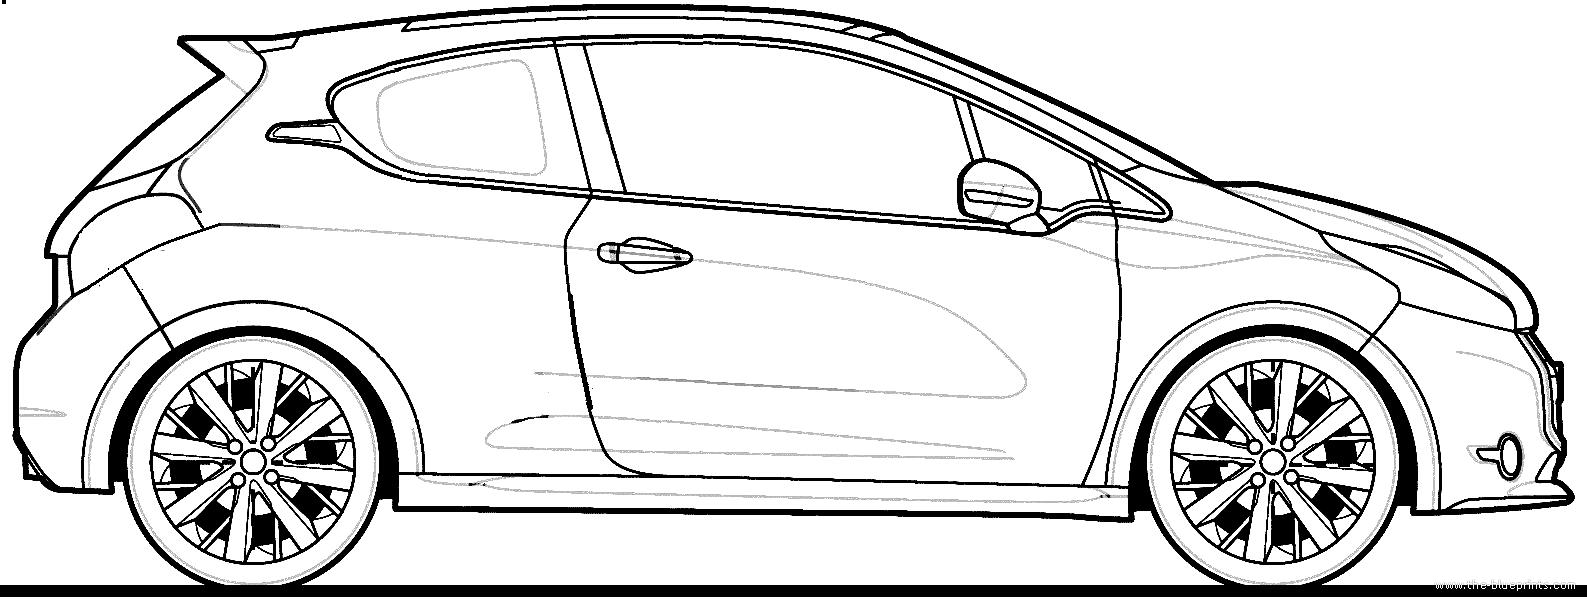 blueprints  u0026gt  cars  u0026gt  peugeot  u0026gt  peugeot 208 gti  2015